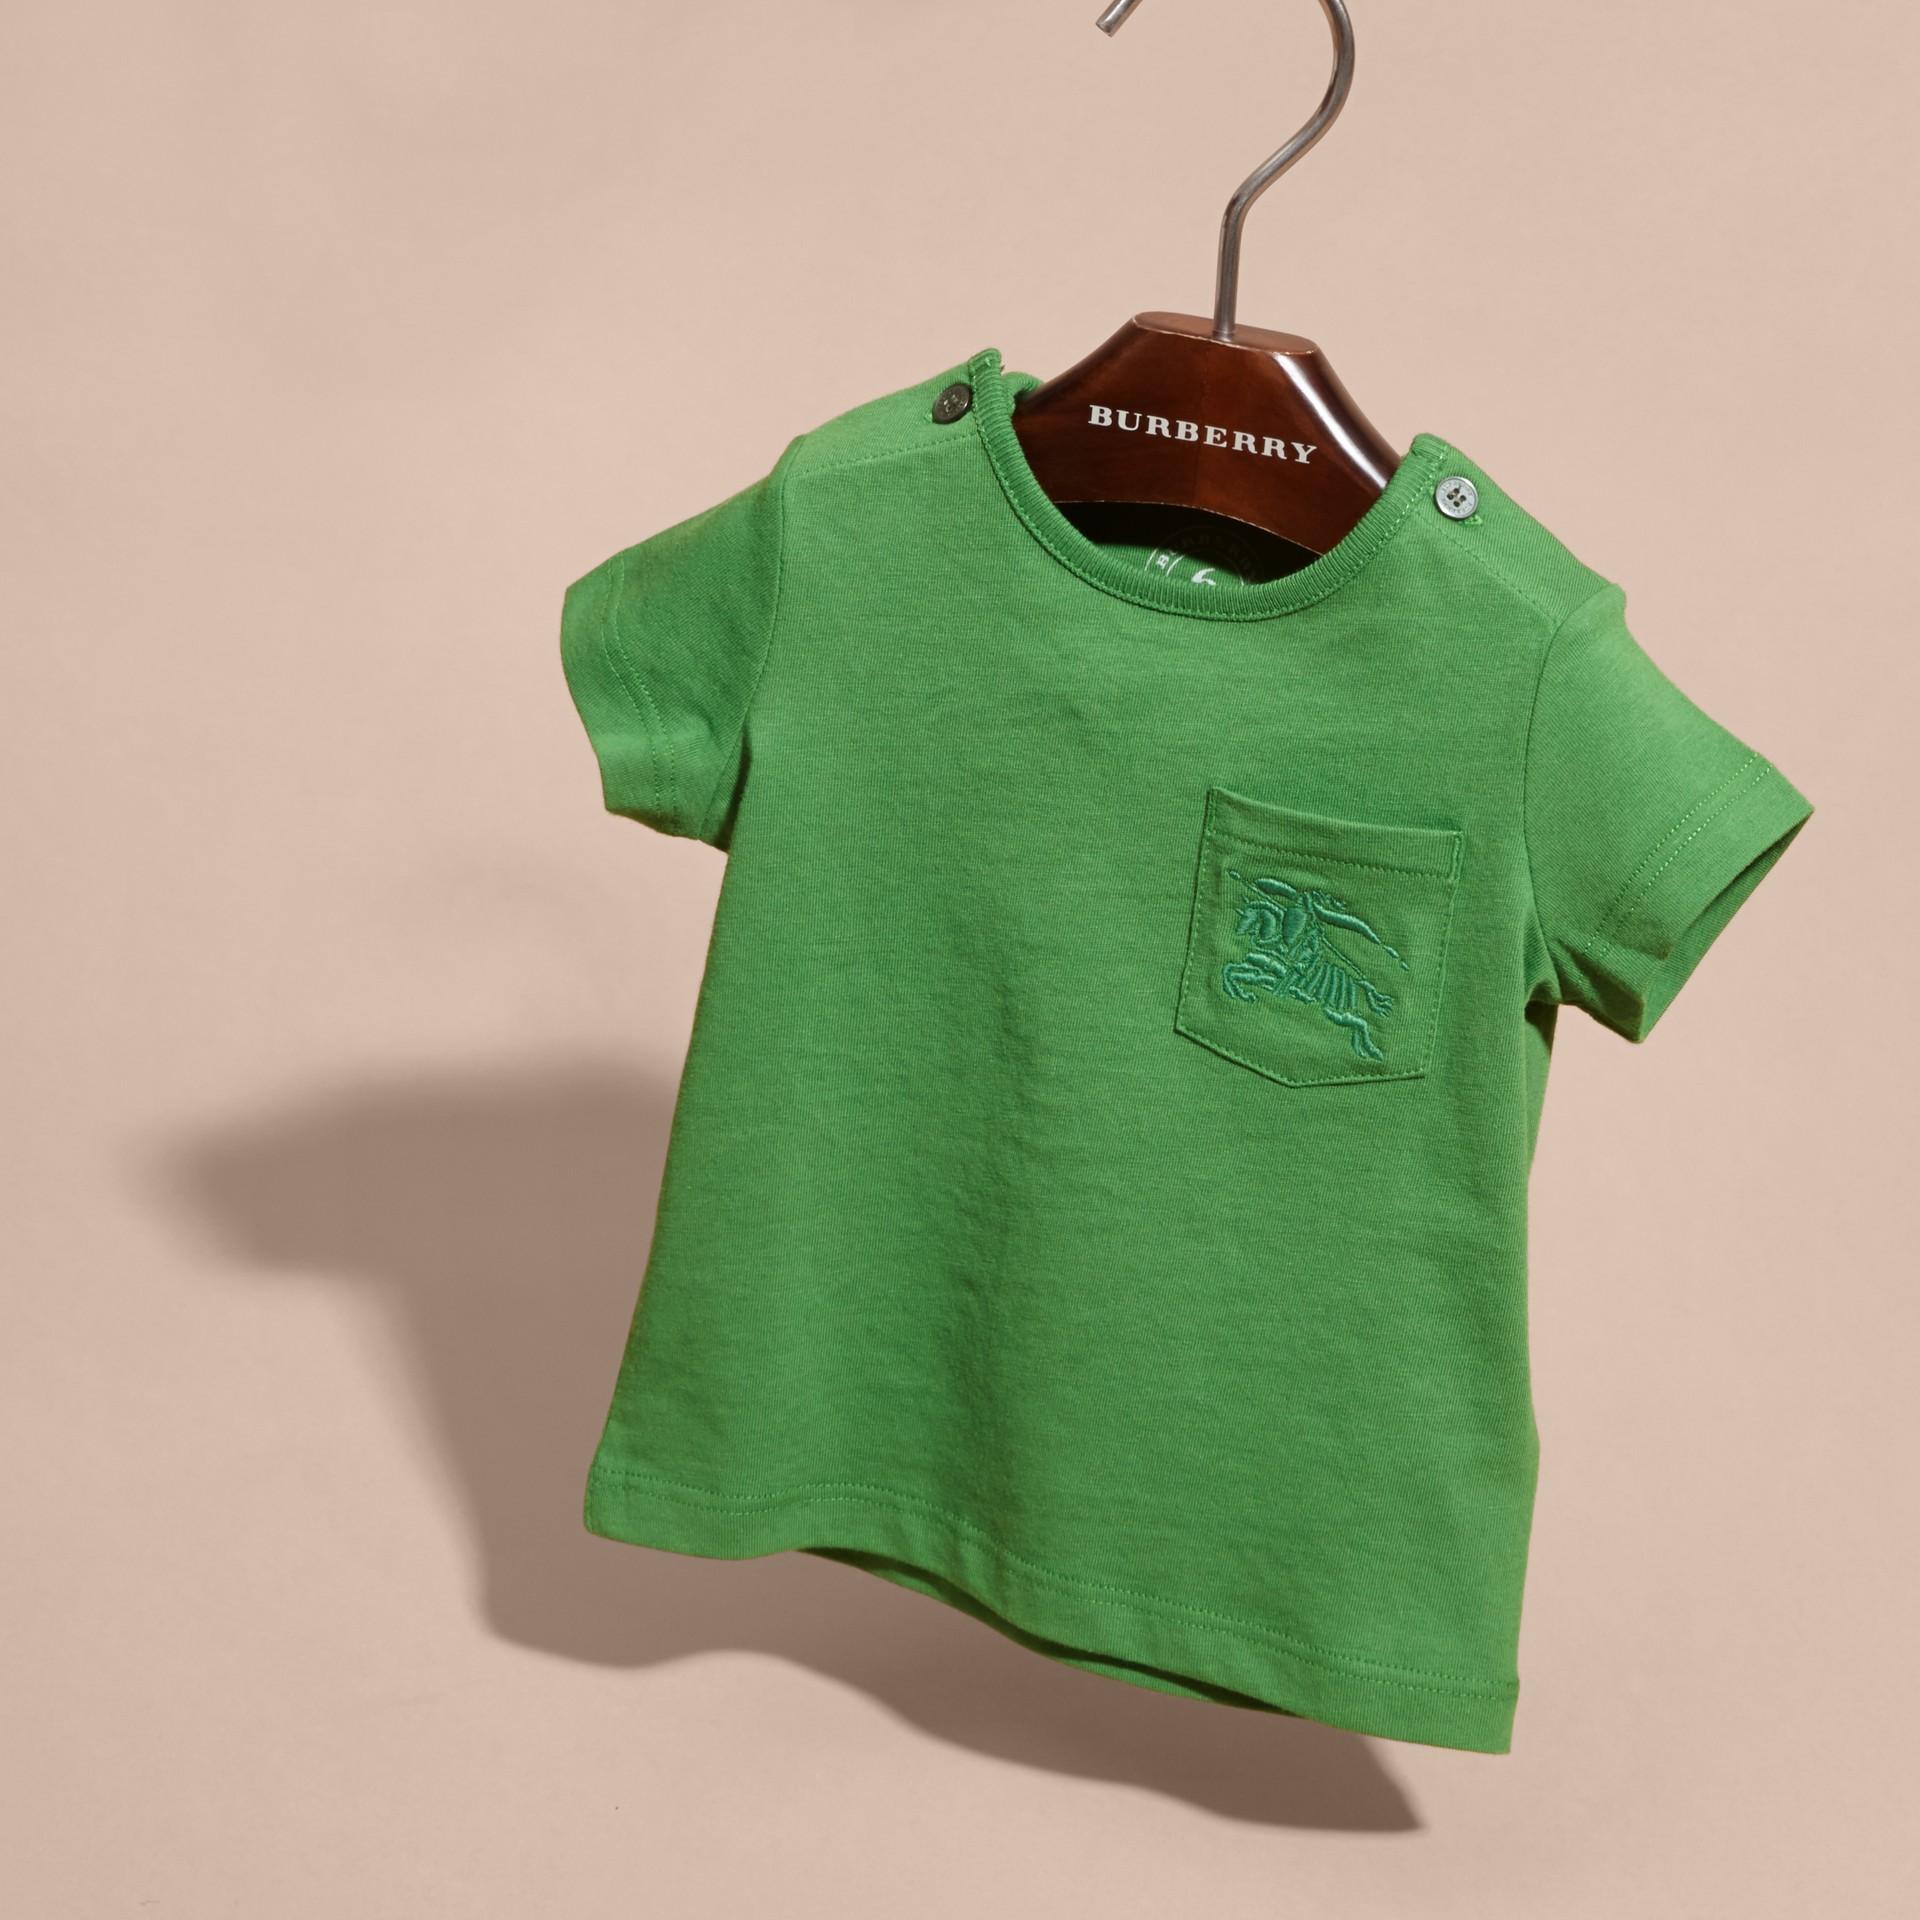 Verde felce brillante T-shirt girocollo in cotone Verde Felce Brillante - immagine della galleria 3